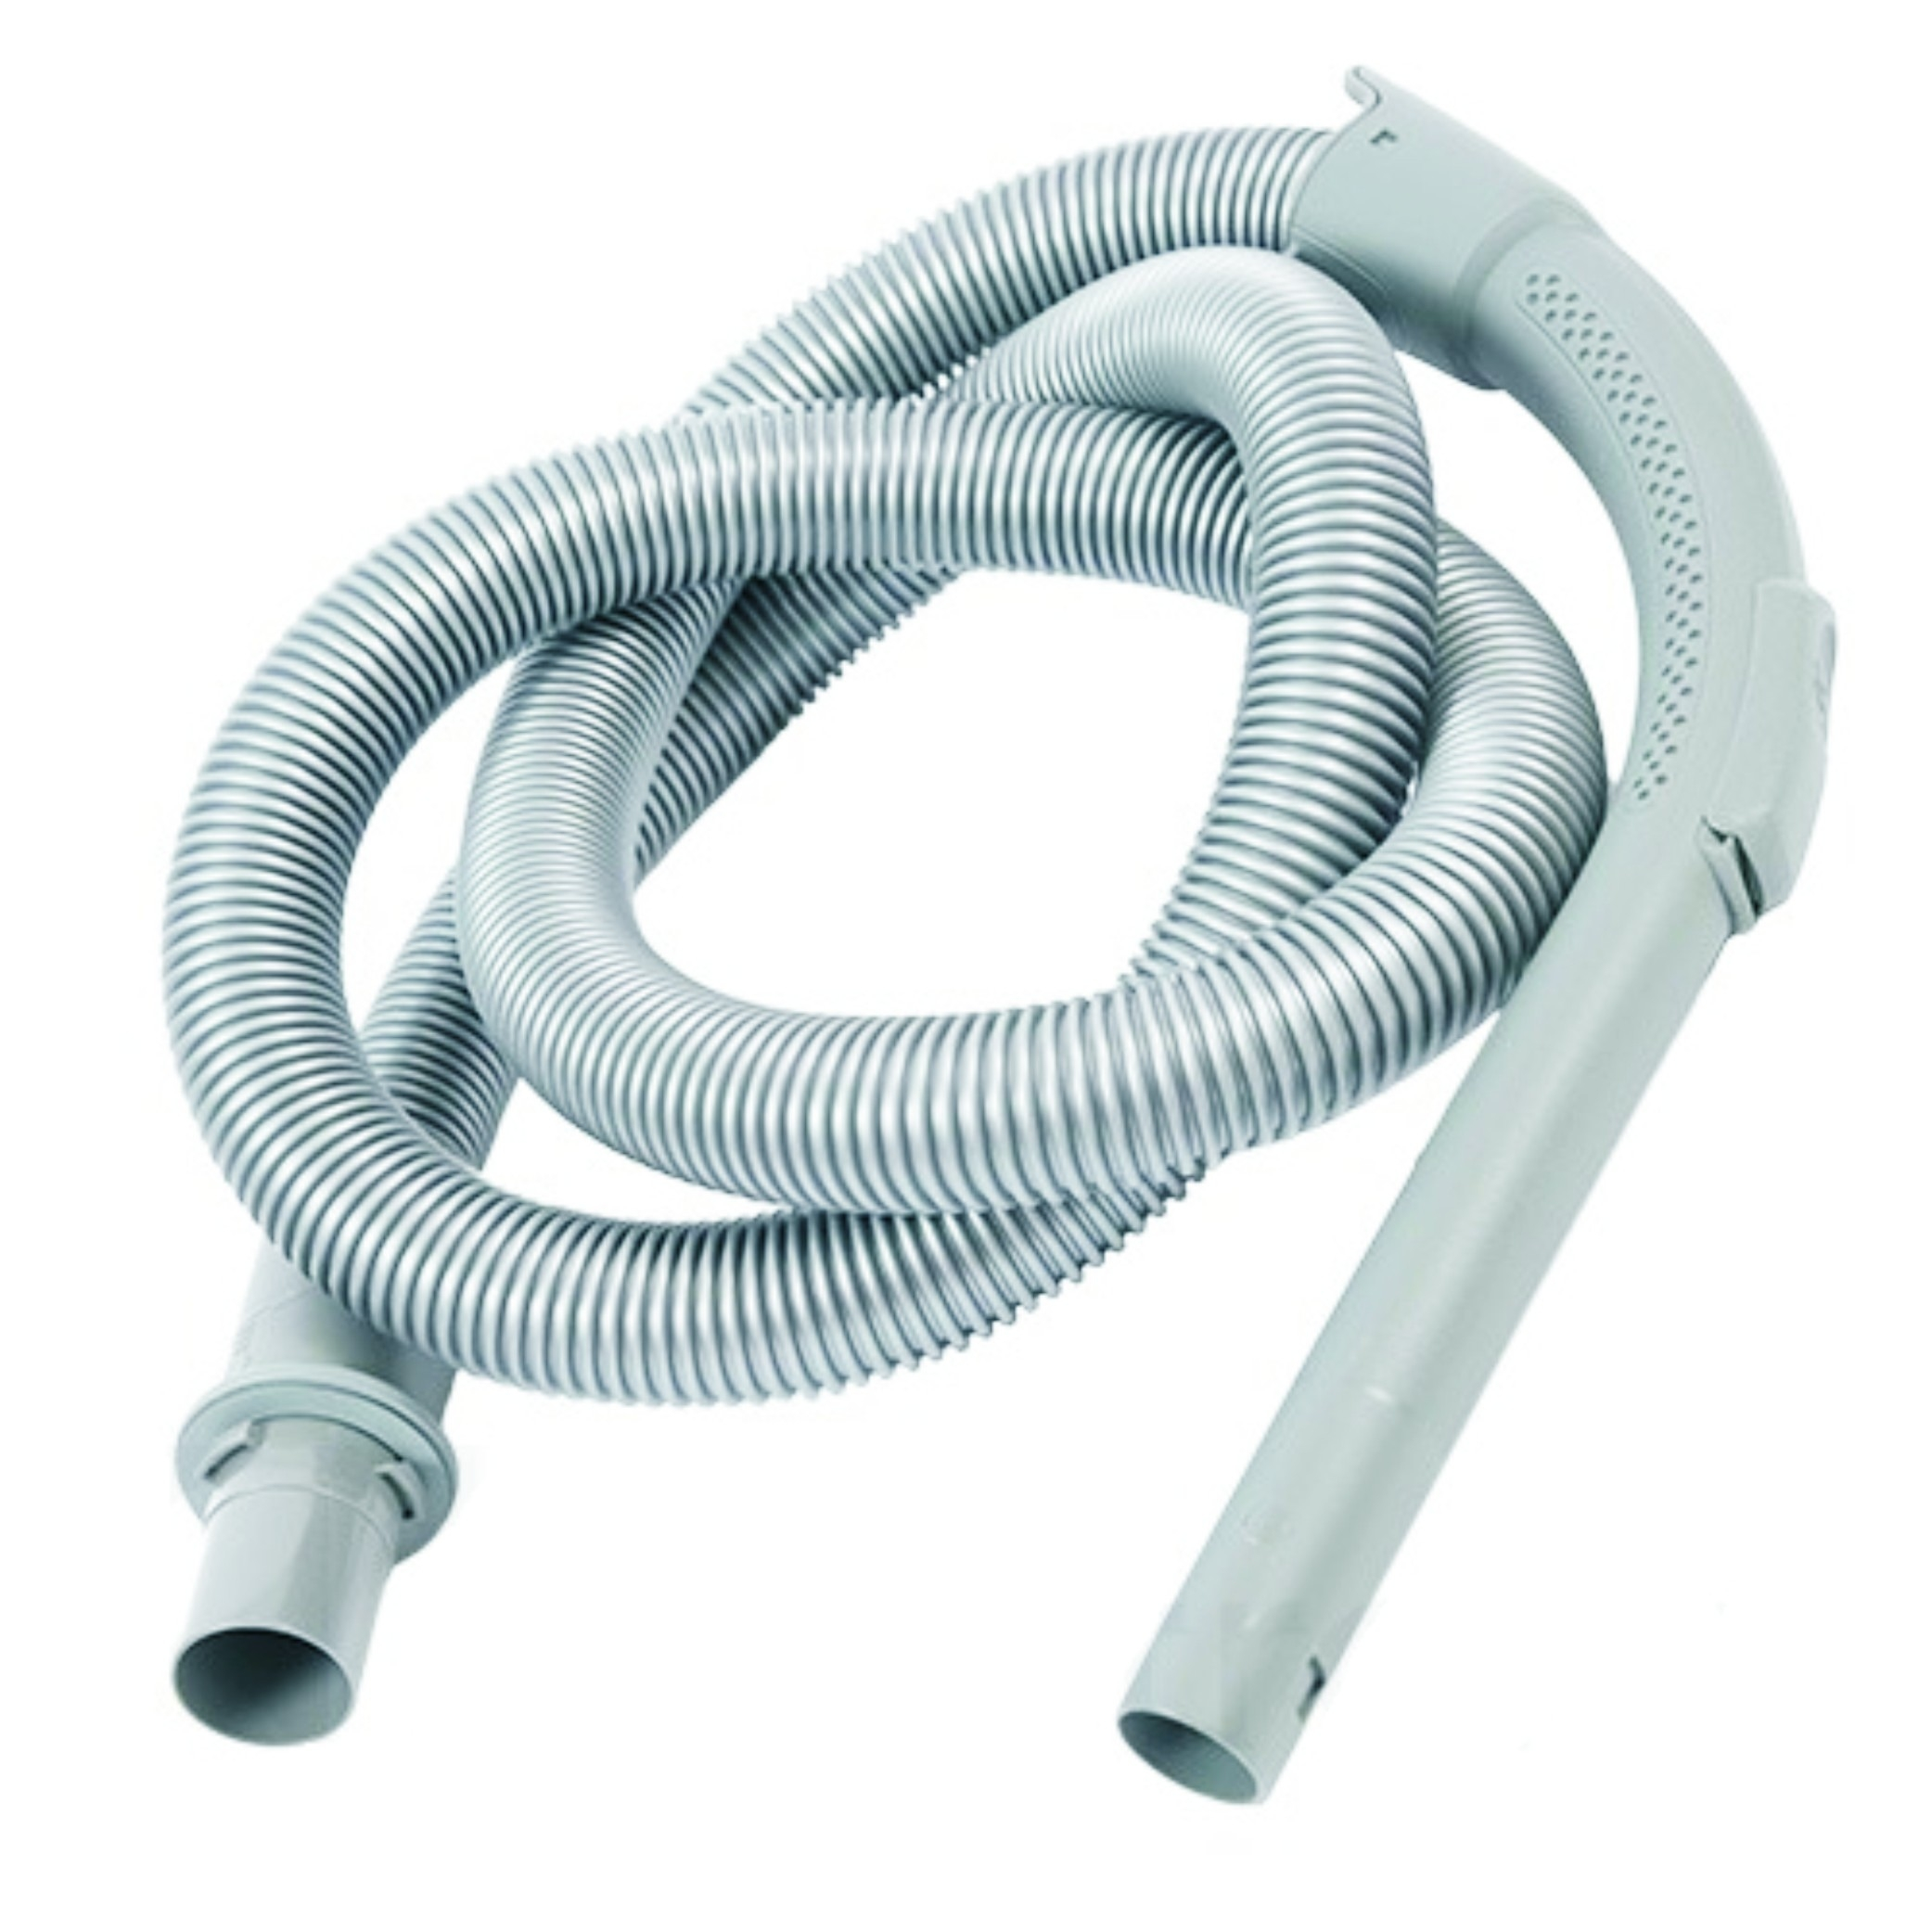 Joint de tuyau pour aspirateur ELECTROLUX 2197083013 MPM